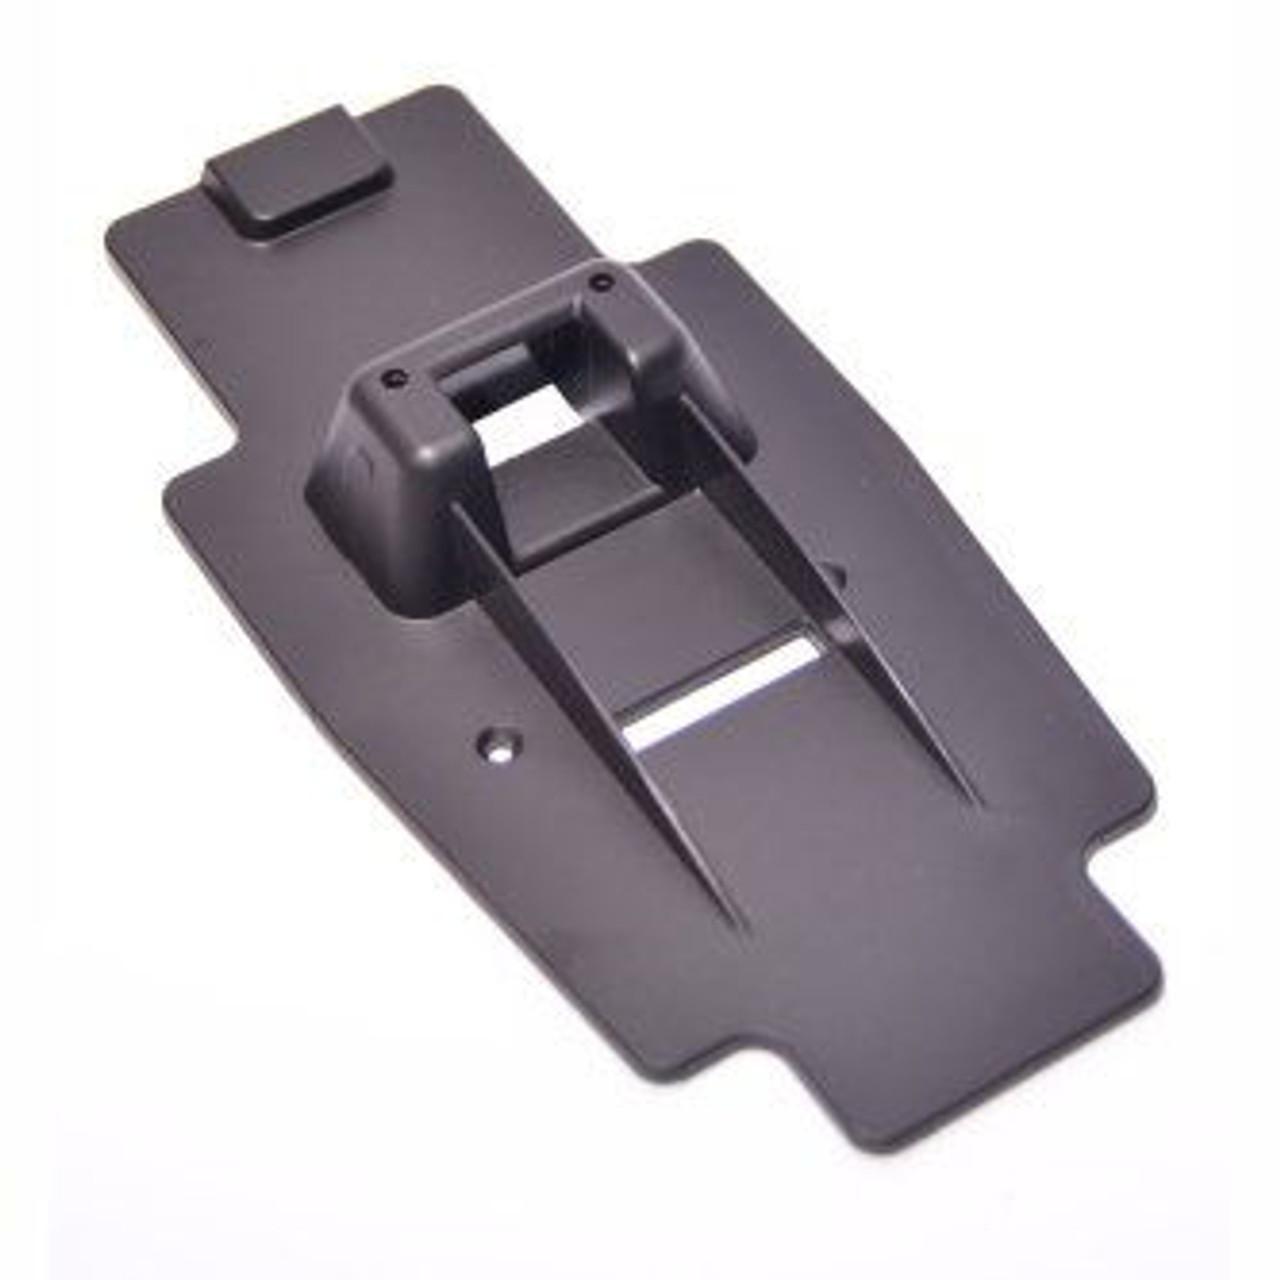 Ingenico Verifone VX520 - 49 MM  Backplate by Tailwind